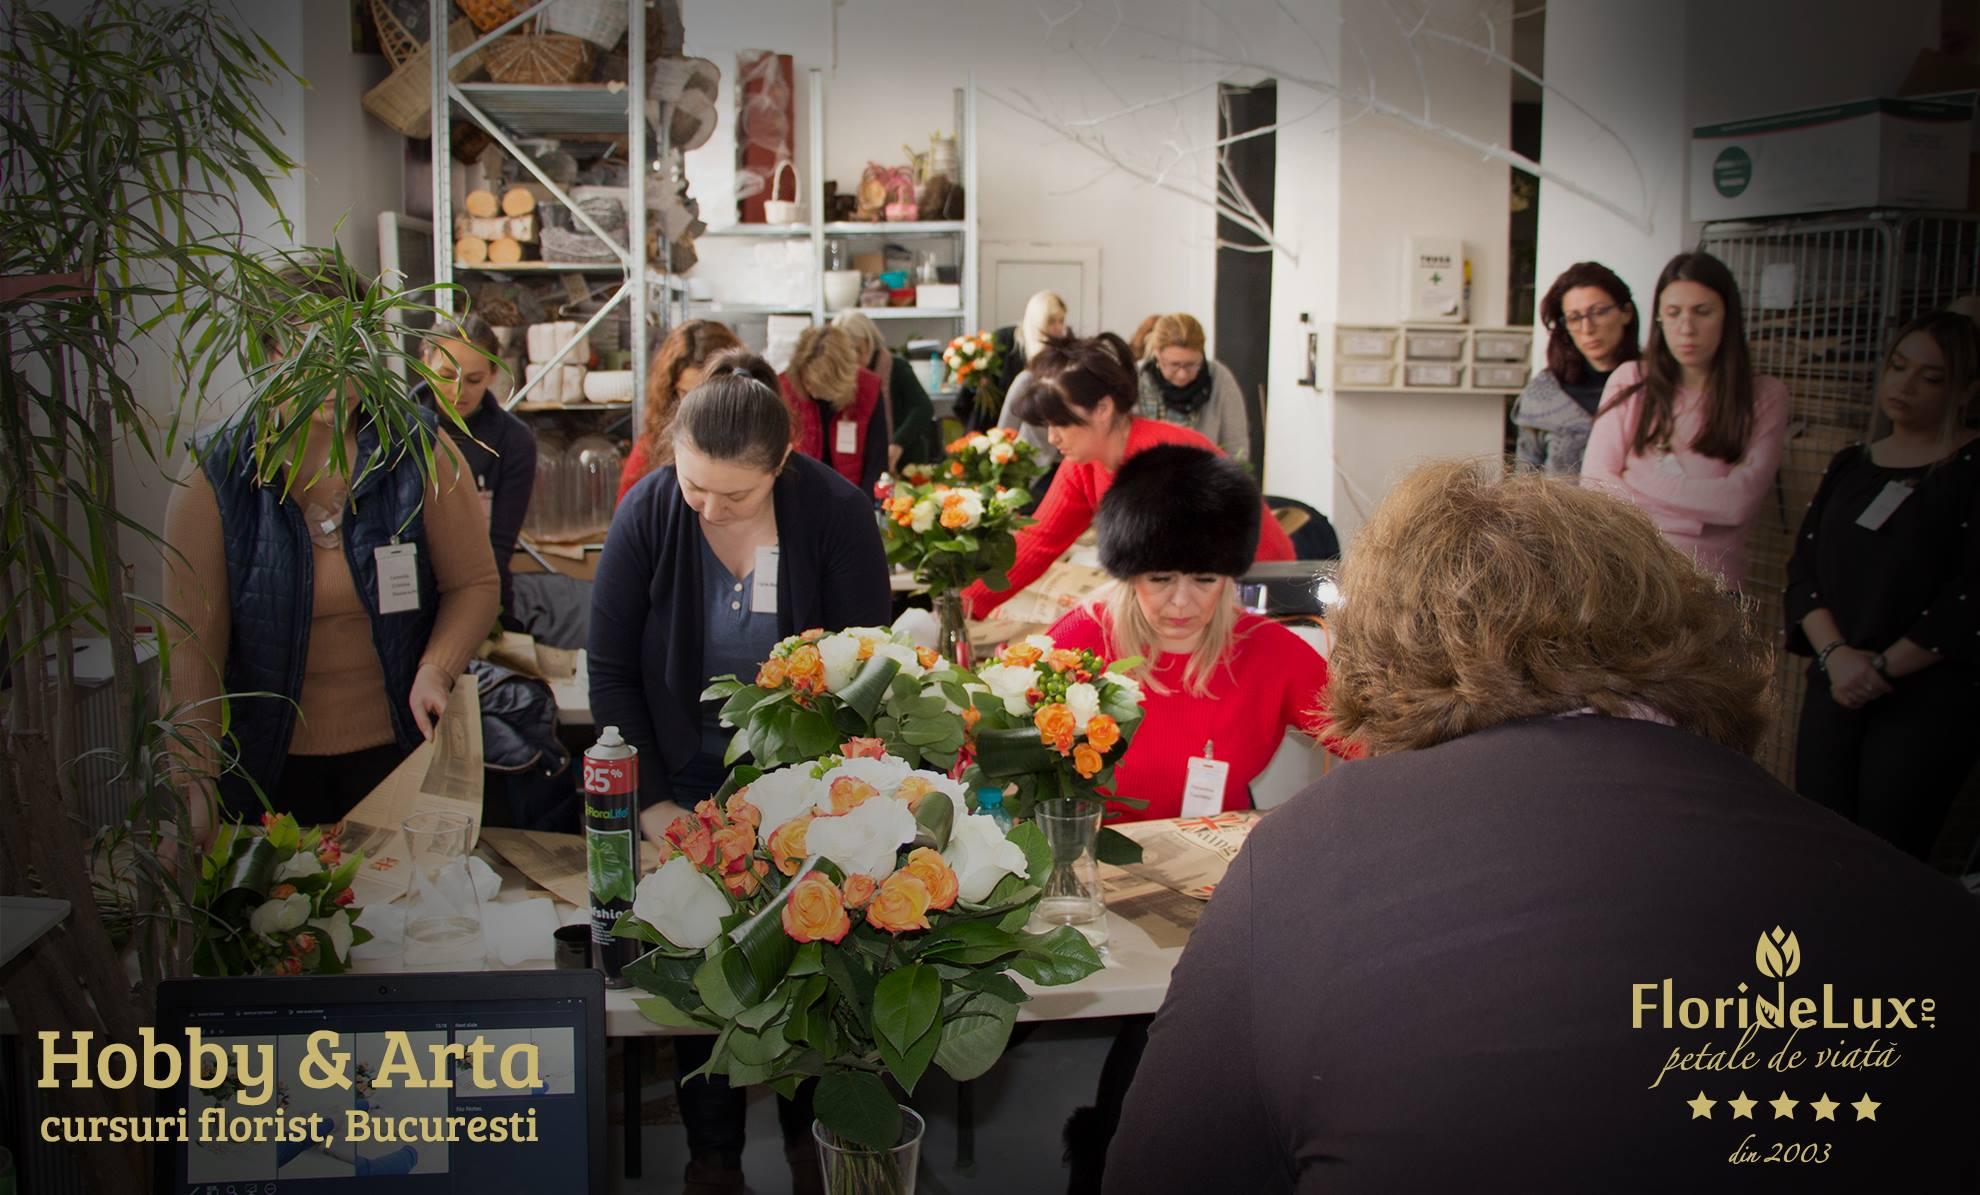 STUDIU DE PIATA: Deficit de aproximativ 10000 de floristi in Romania